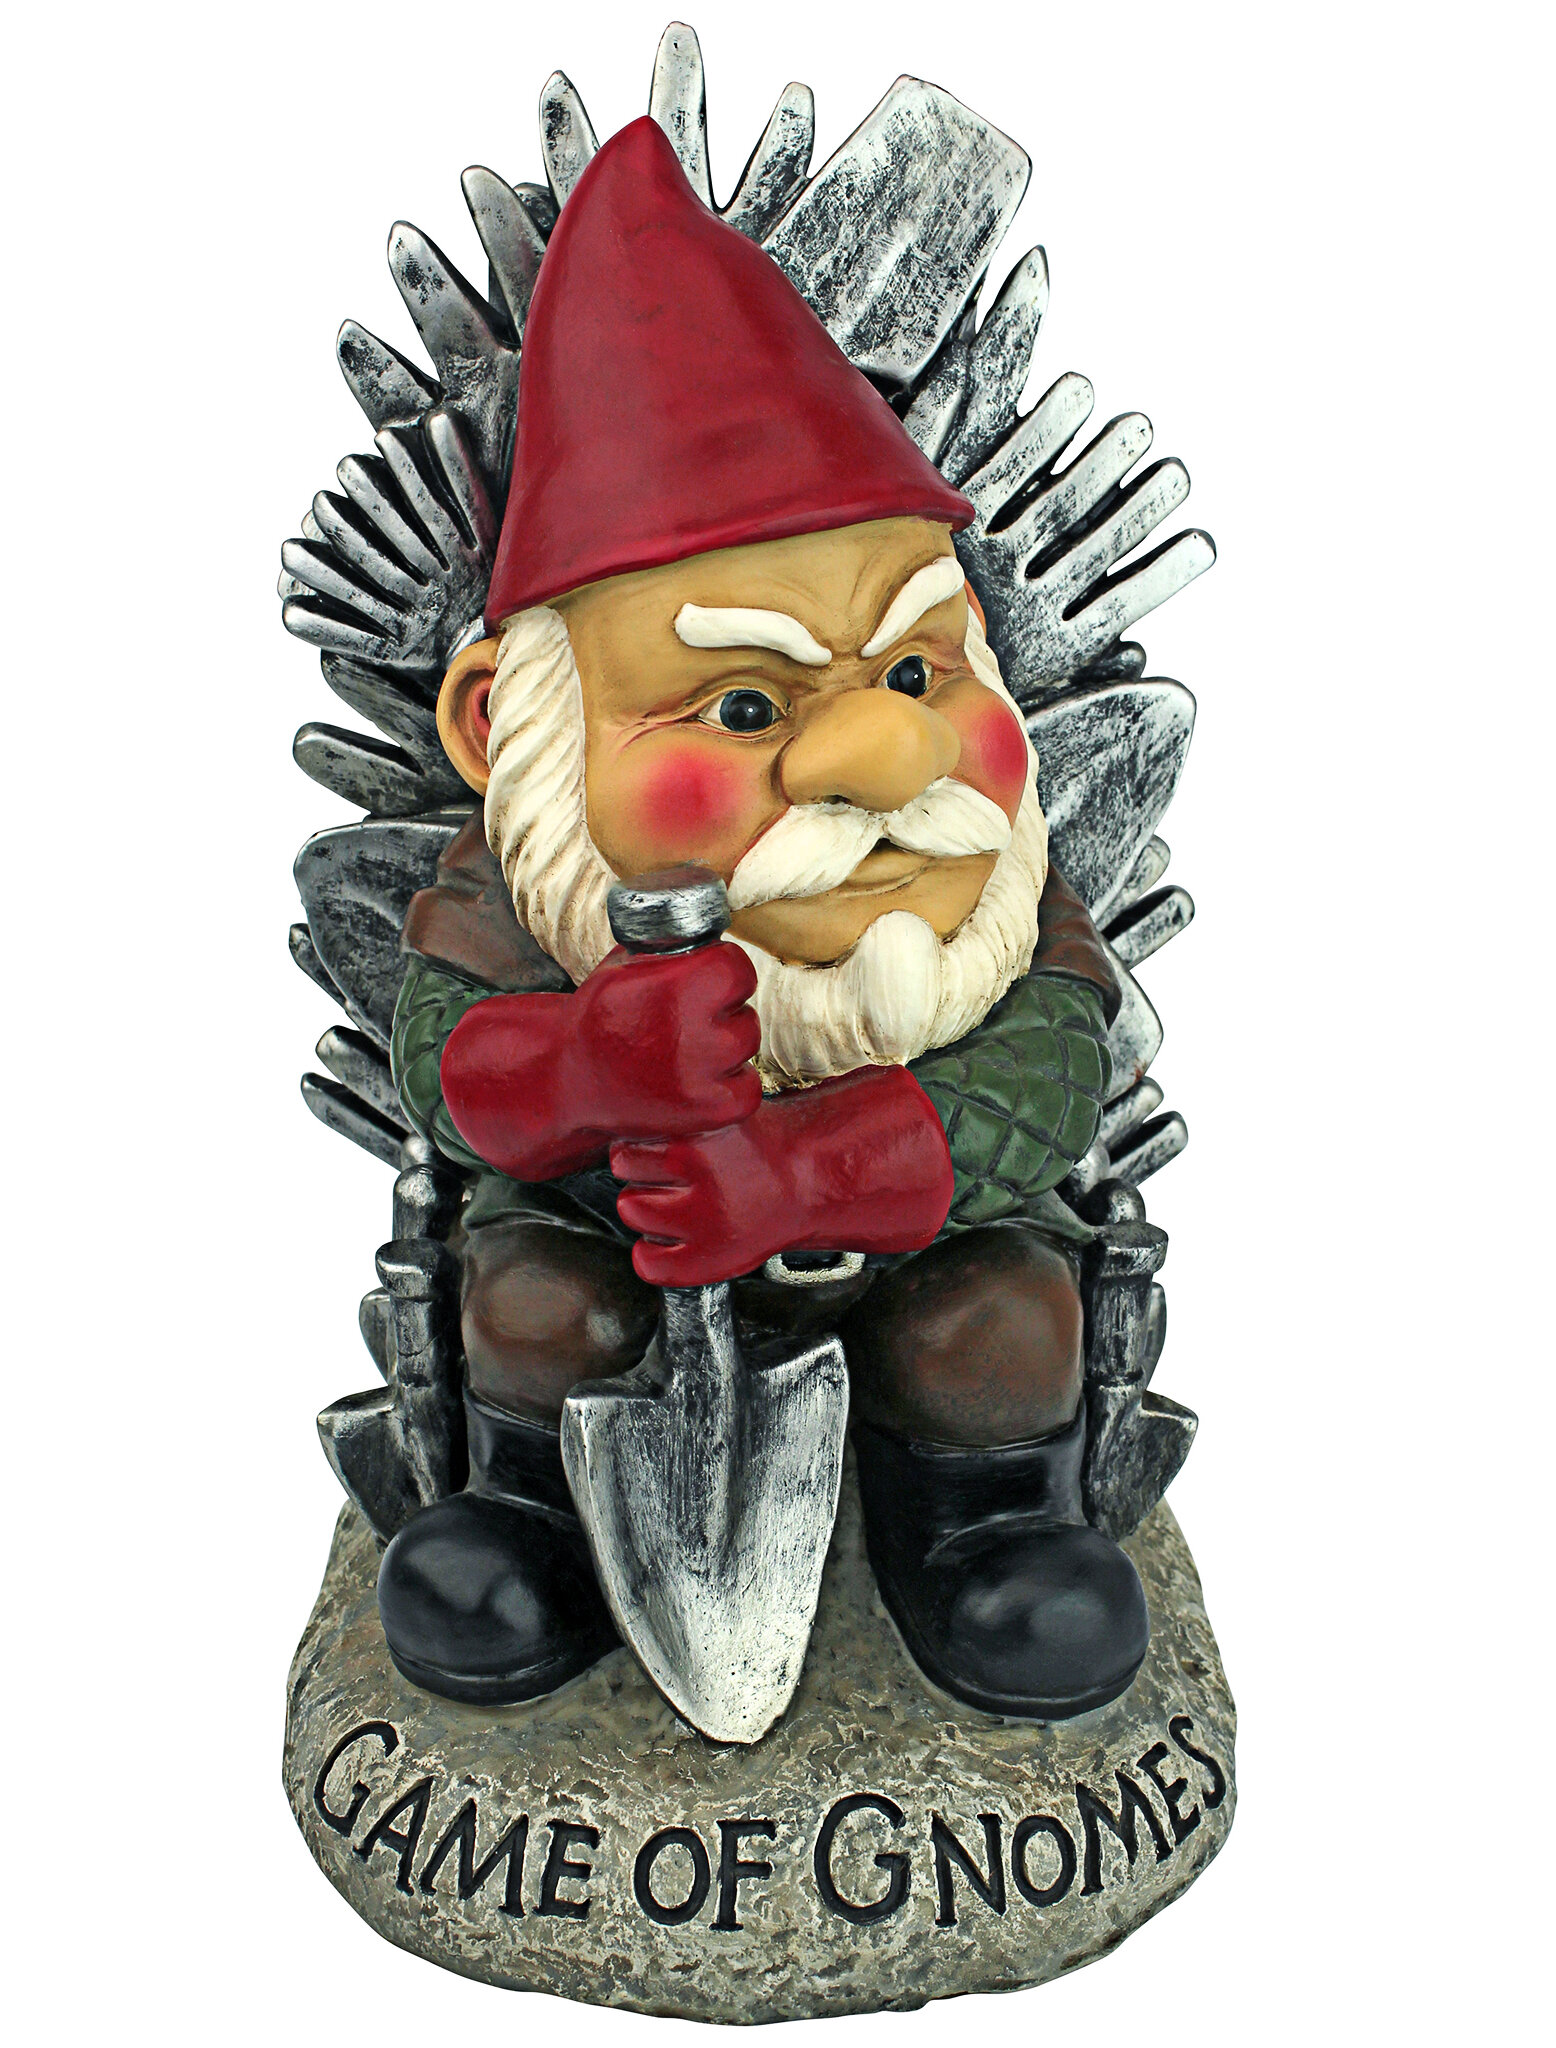 Game of Gnomes Garden Statue